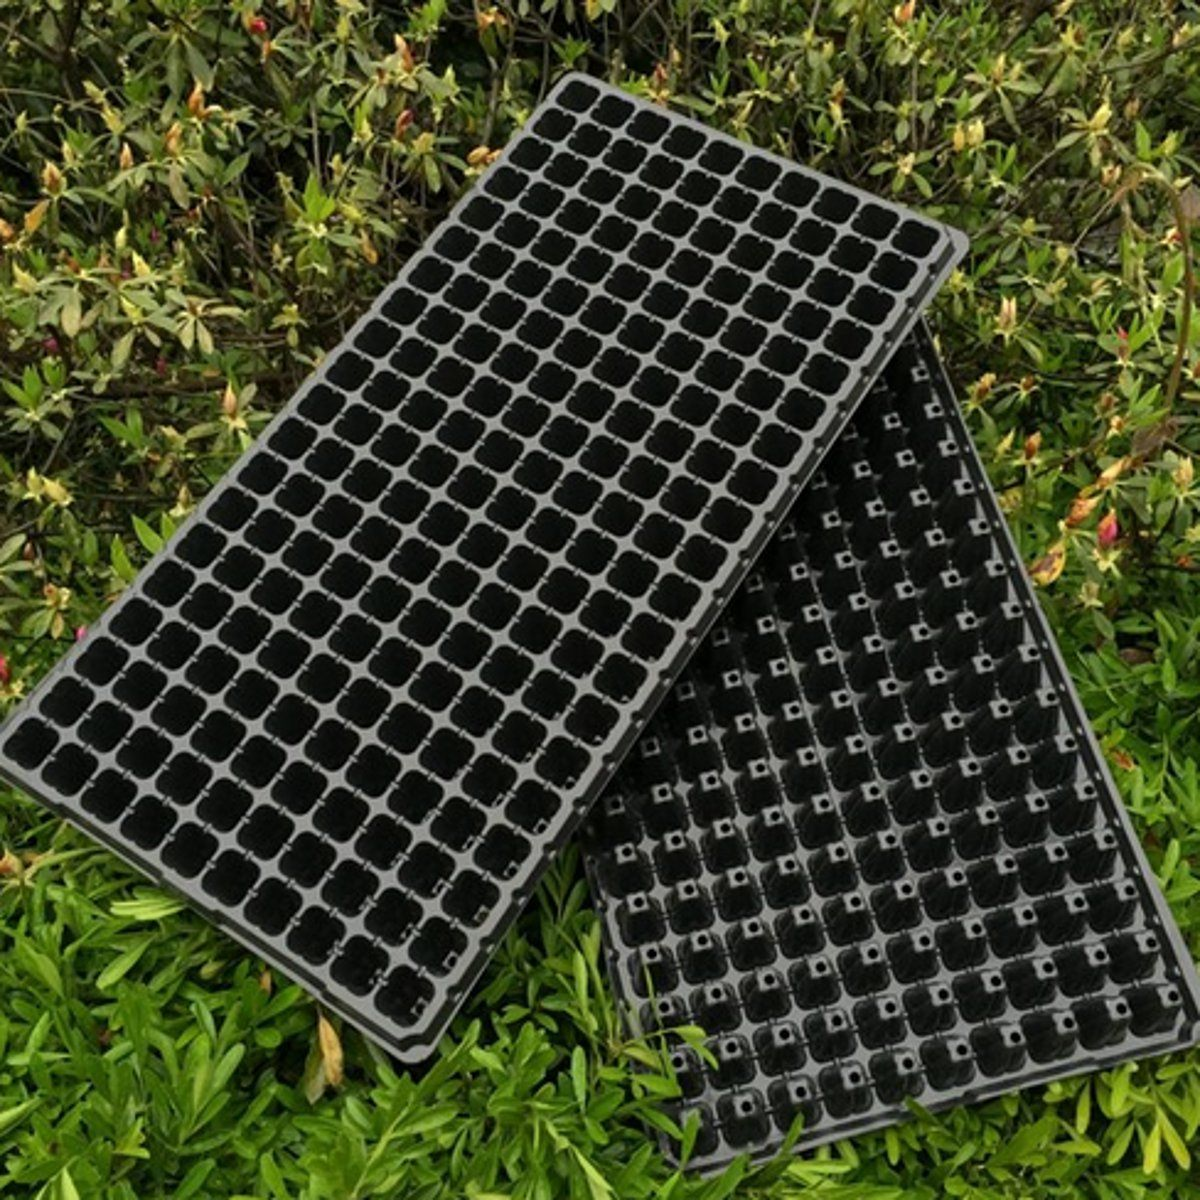 Seedling Starter Planting Tray Extra Strength Seed Germination Vegetable Plant Flower Pot Nursery Grow Box Propagation 200 Holes